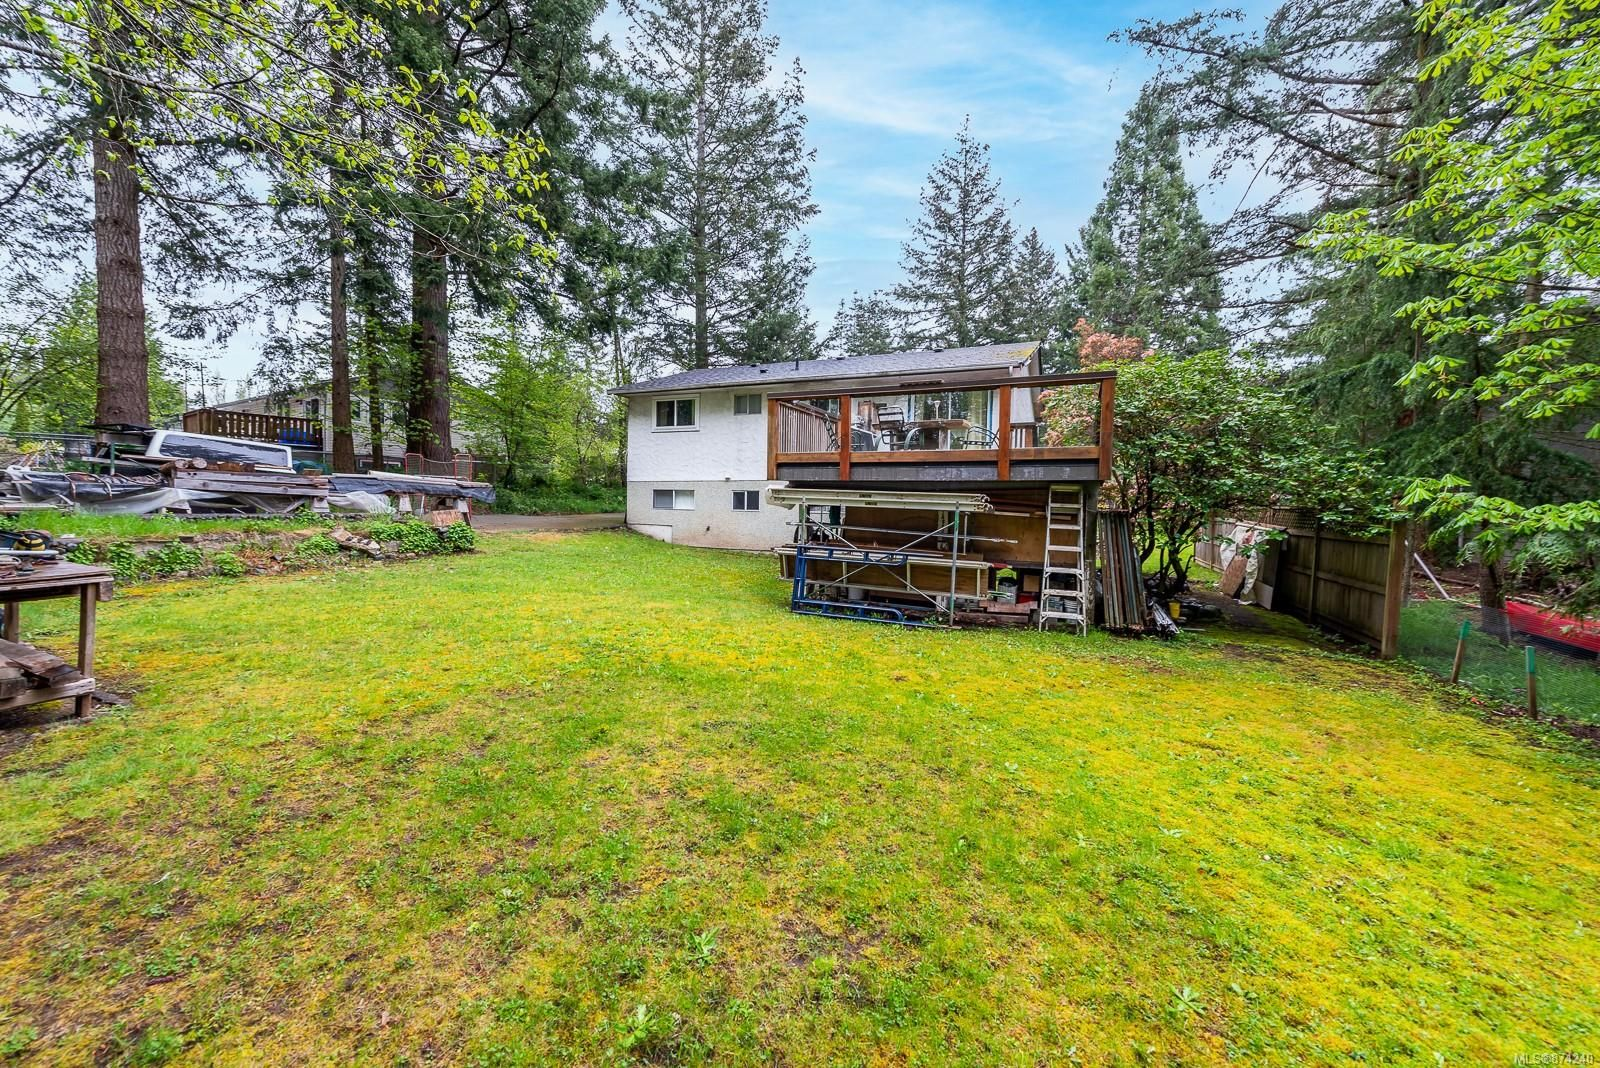 Photo 10: Photos: 359 Cortez Cres in : CV Comox (Town of) House for sale (Comox Valley)  : MLS®# 874240